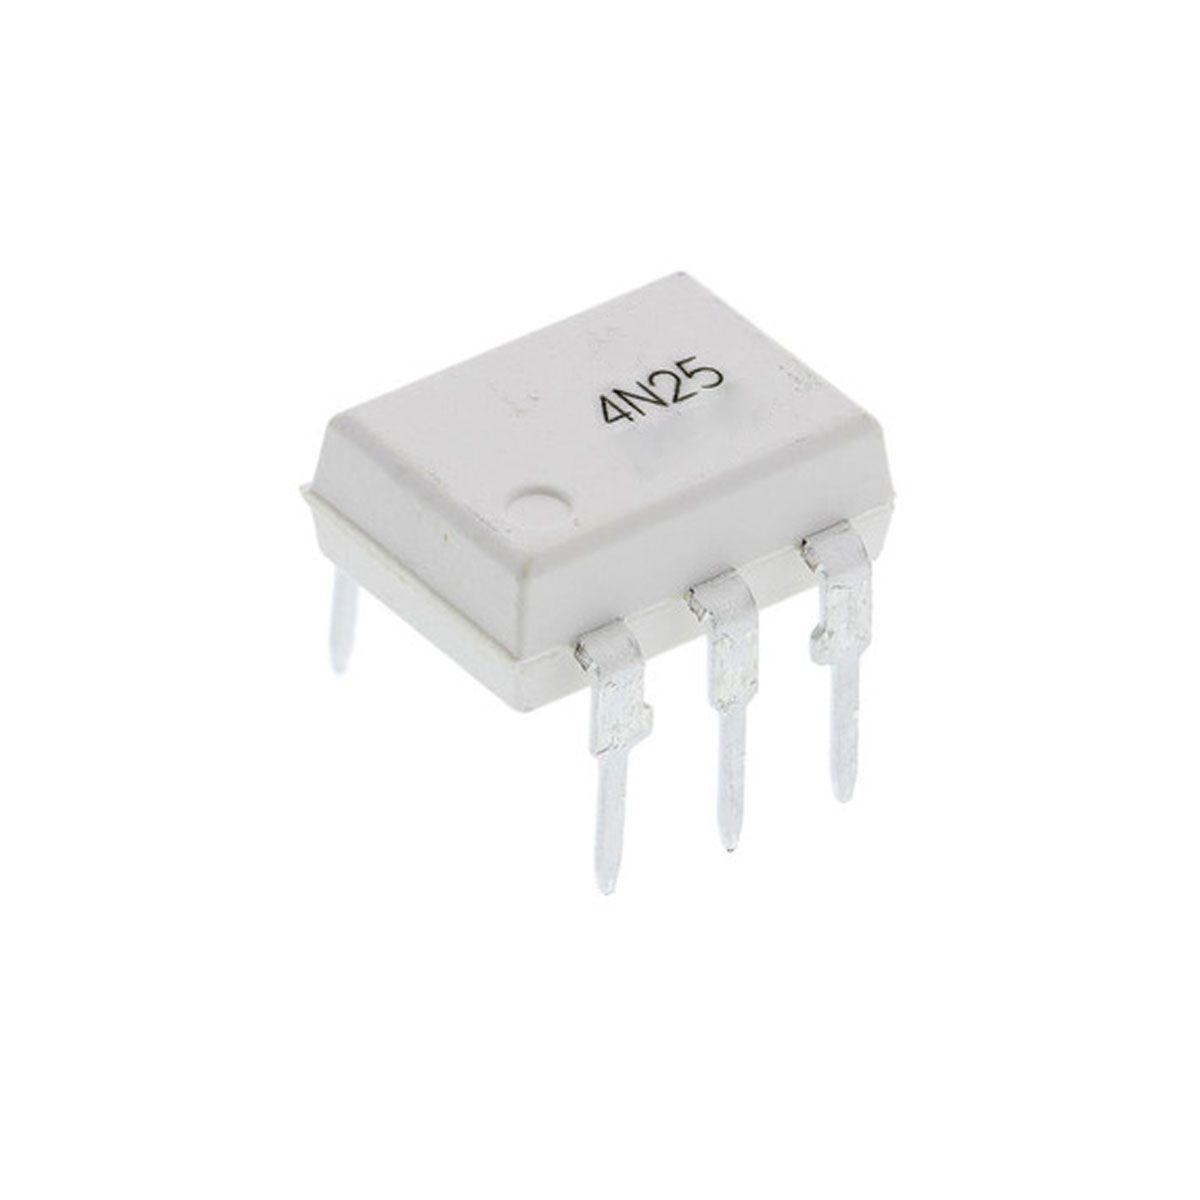 5x Circuito Integrado - CI Optoacoplador / Foto Acoplador 4N25 Dip